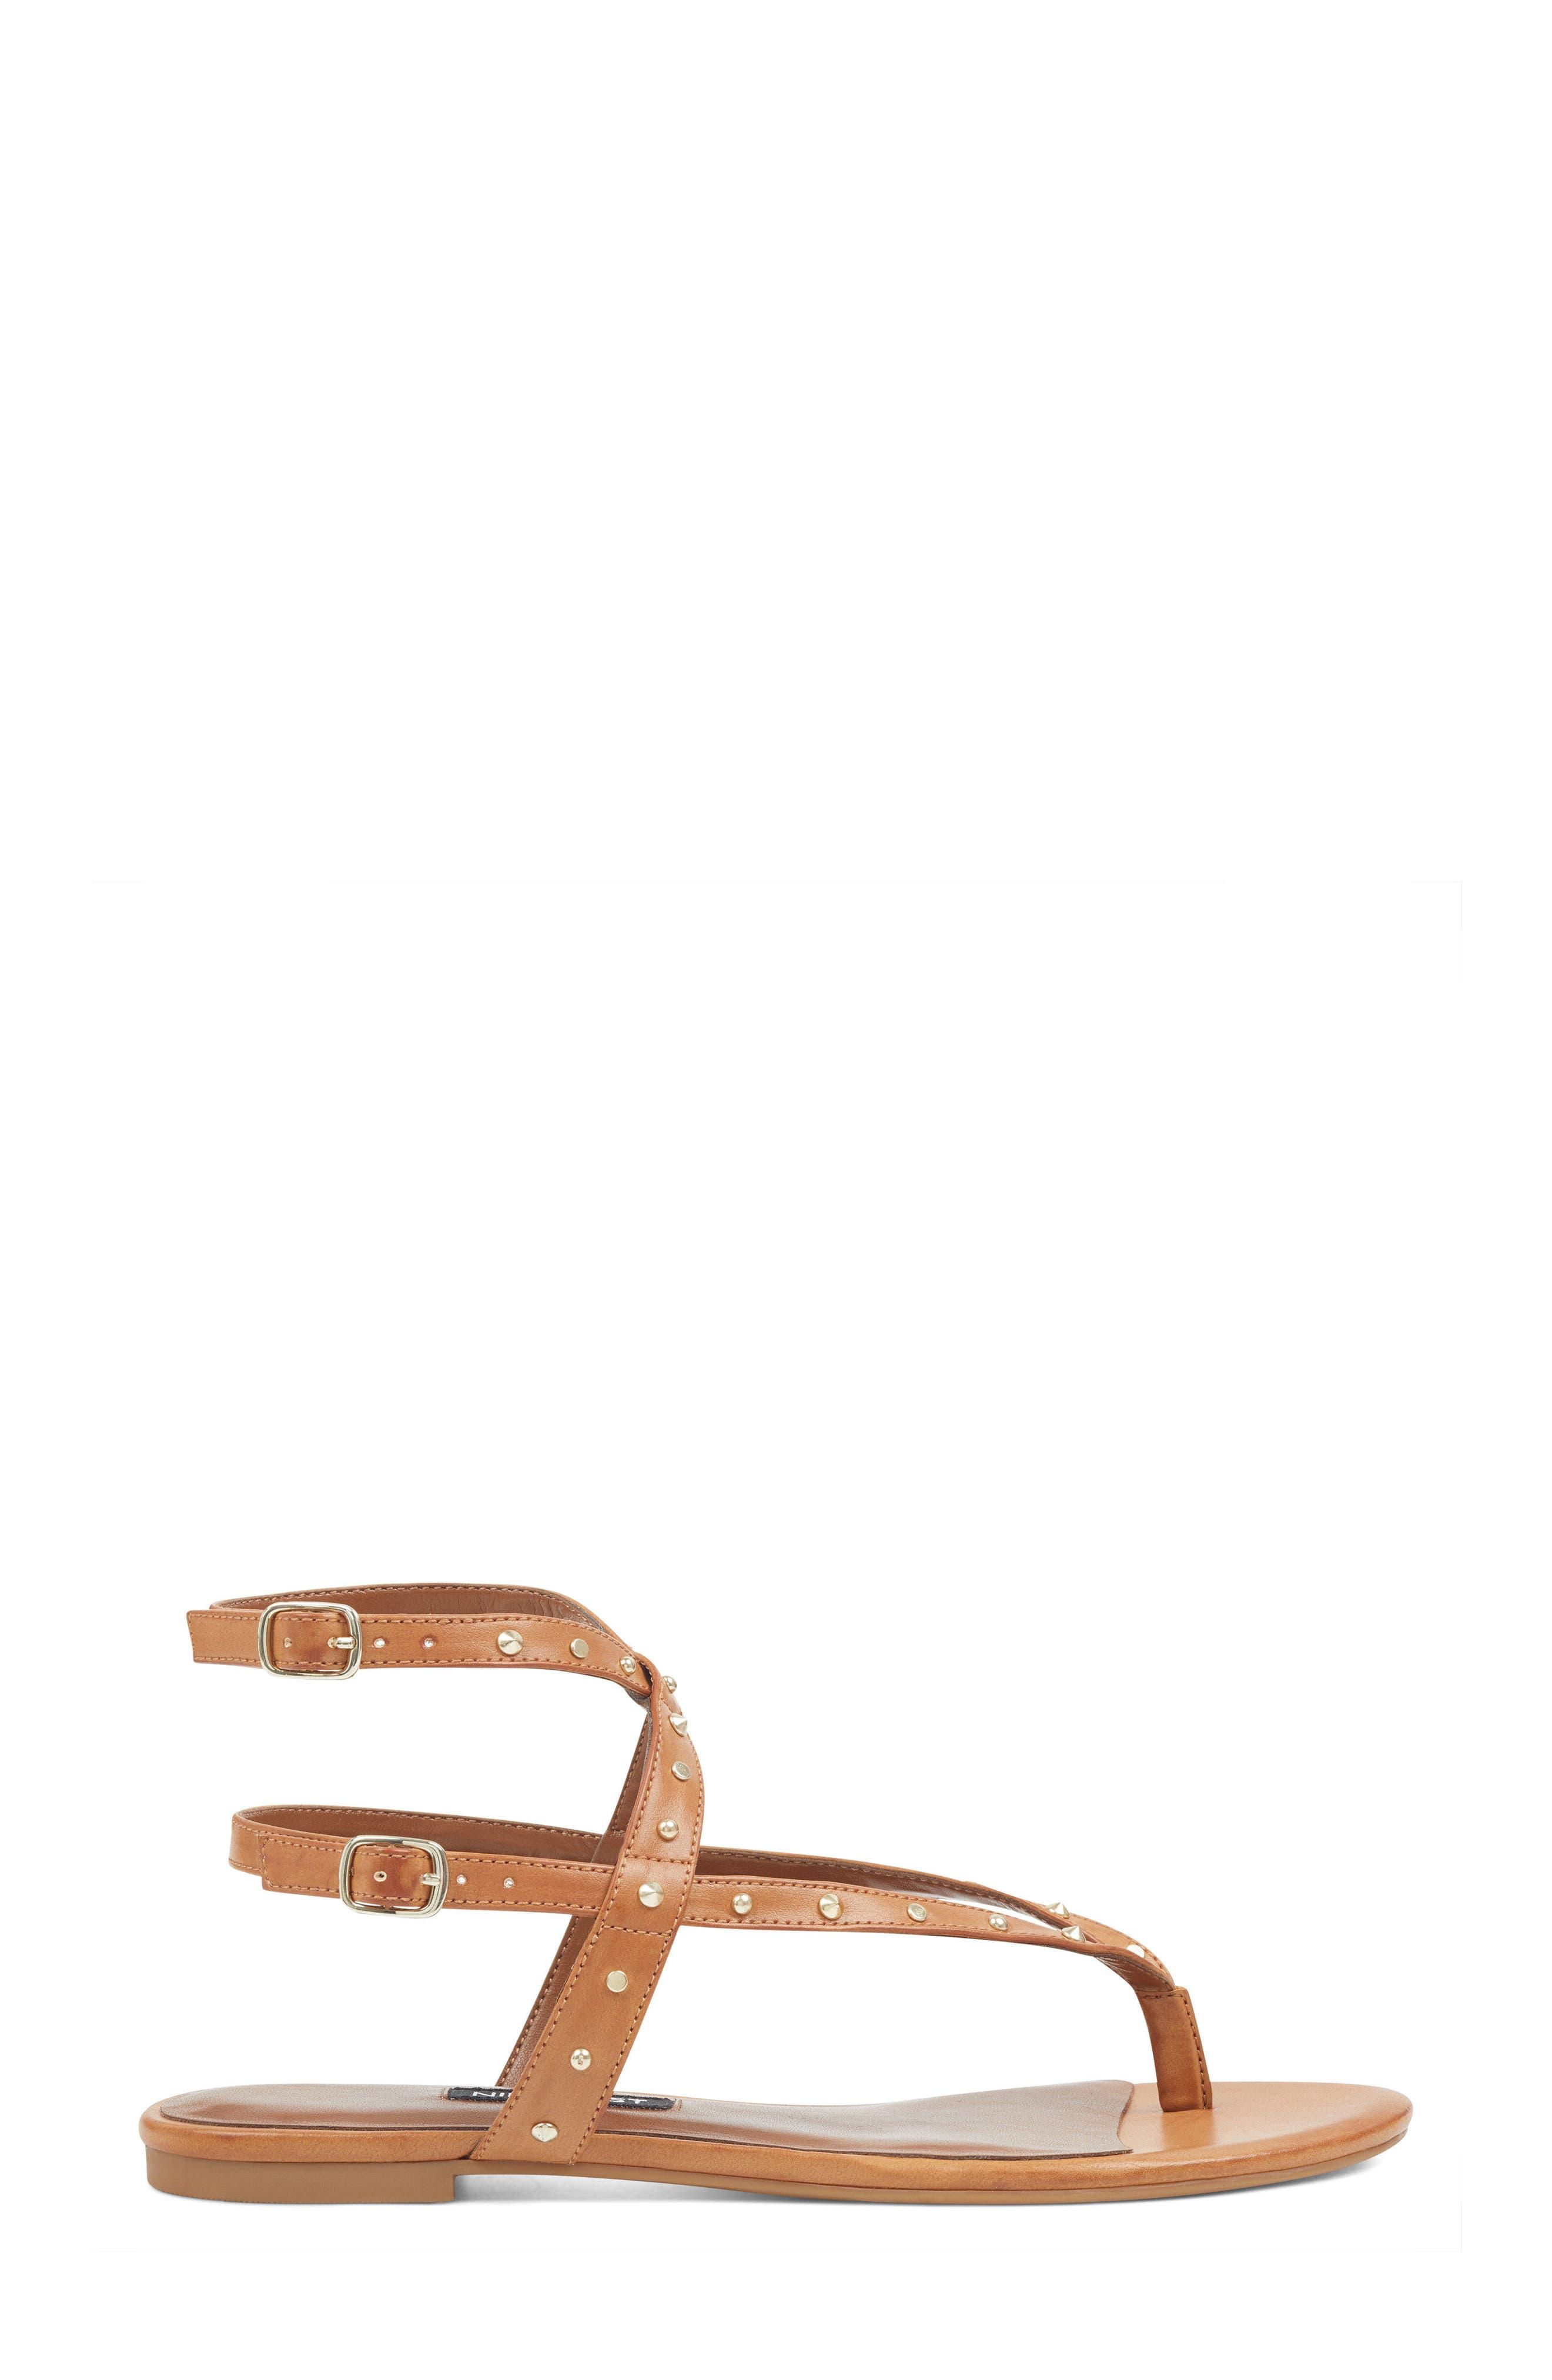 Simcha Studded Wraparound Sandal,                             Alternate thumbnail 3, color,                             Dark Natural Faux Leather